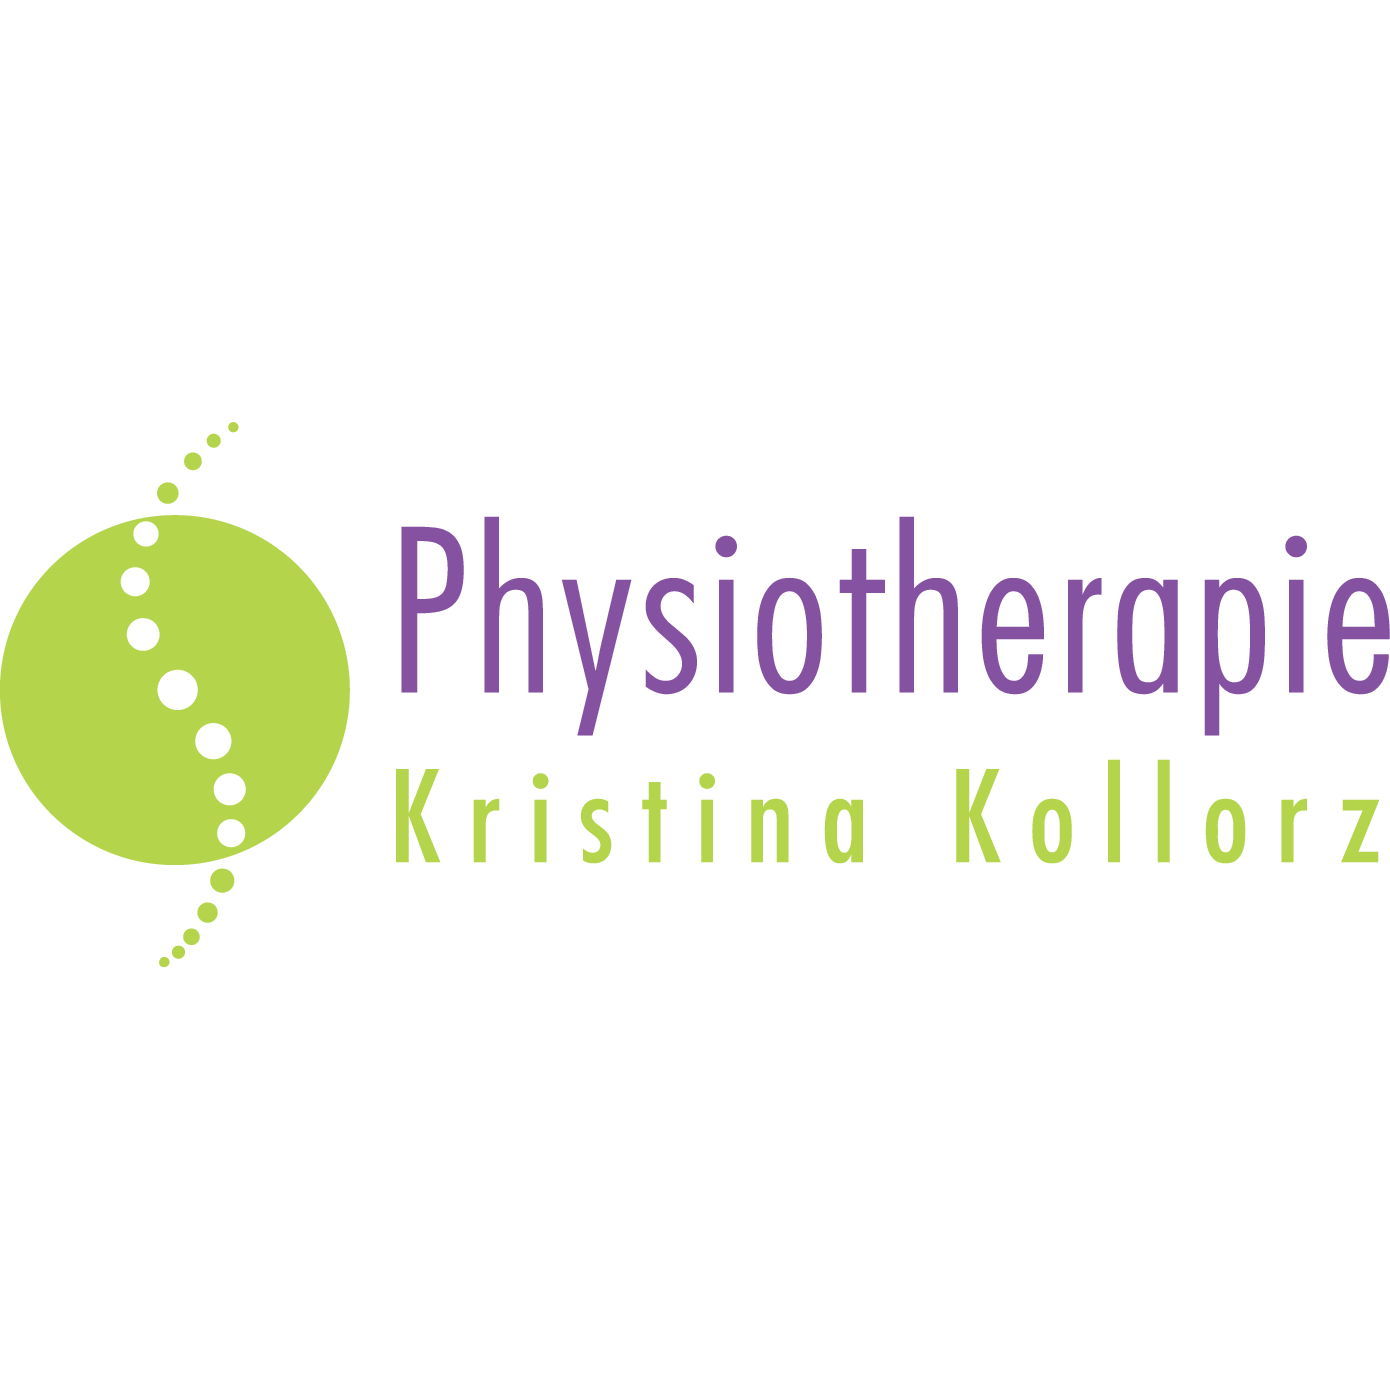 Bild zu Physiotherapie Kristina Kollorz in Postbauer Heng